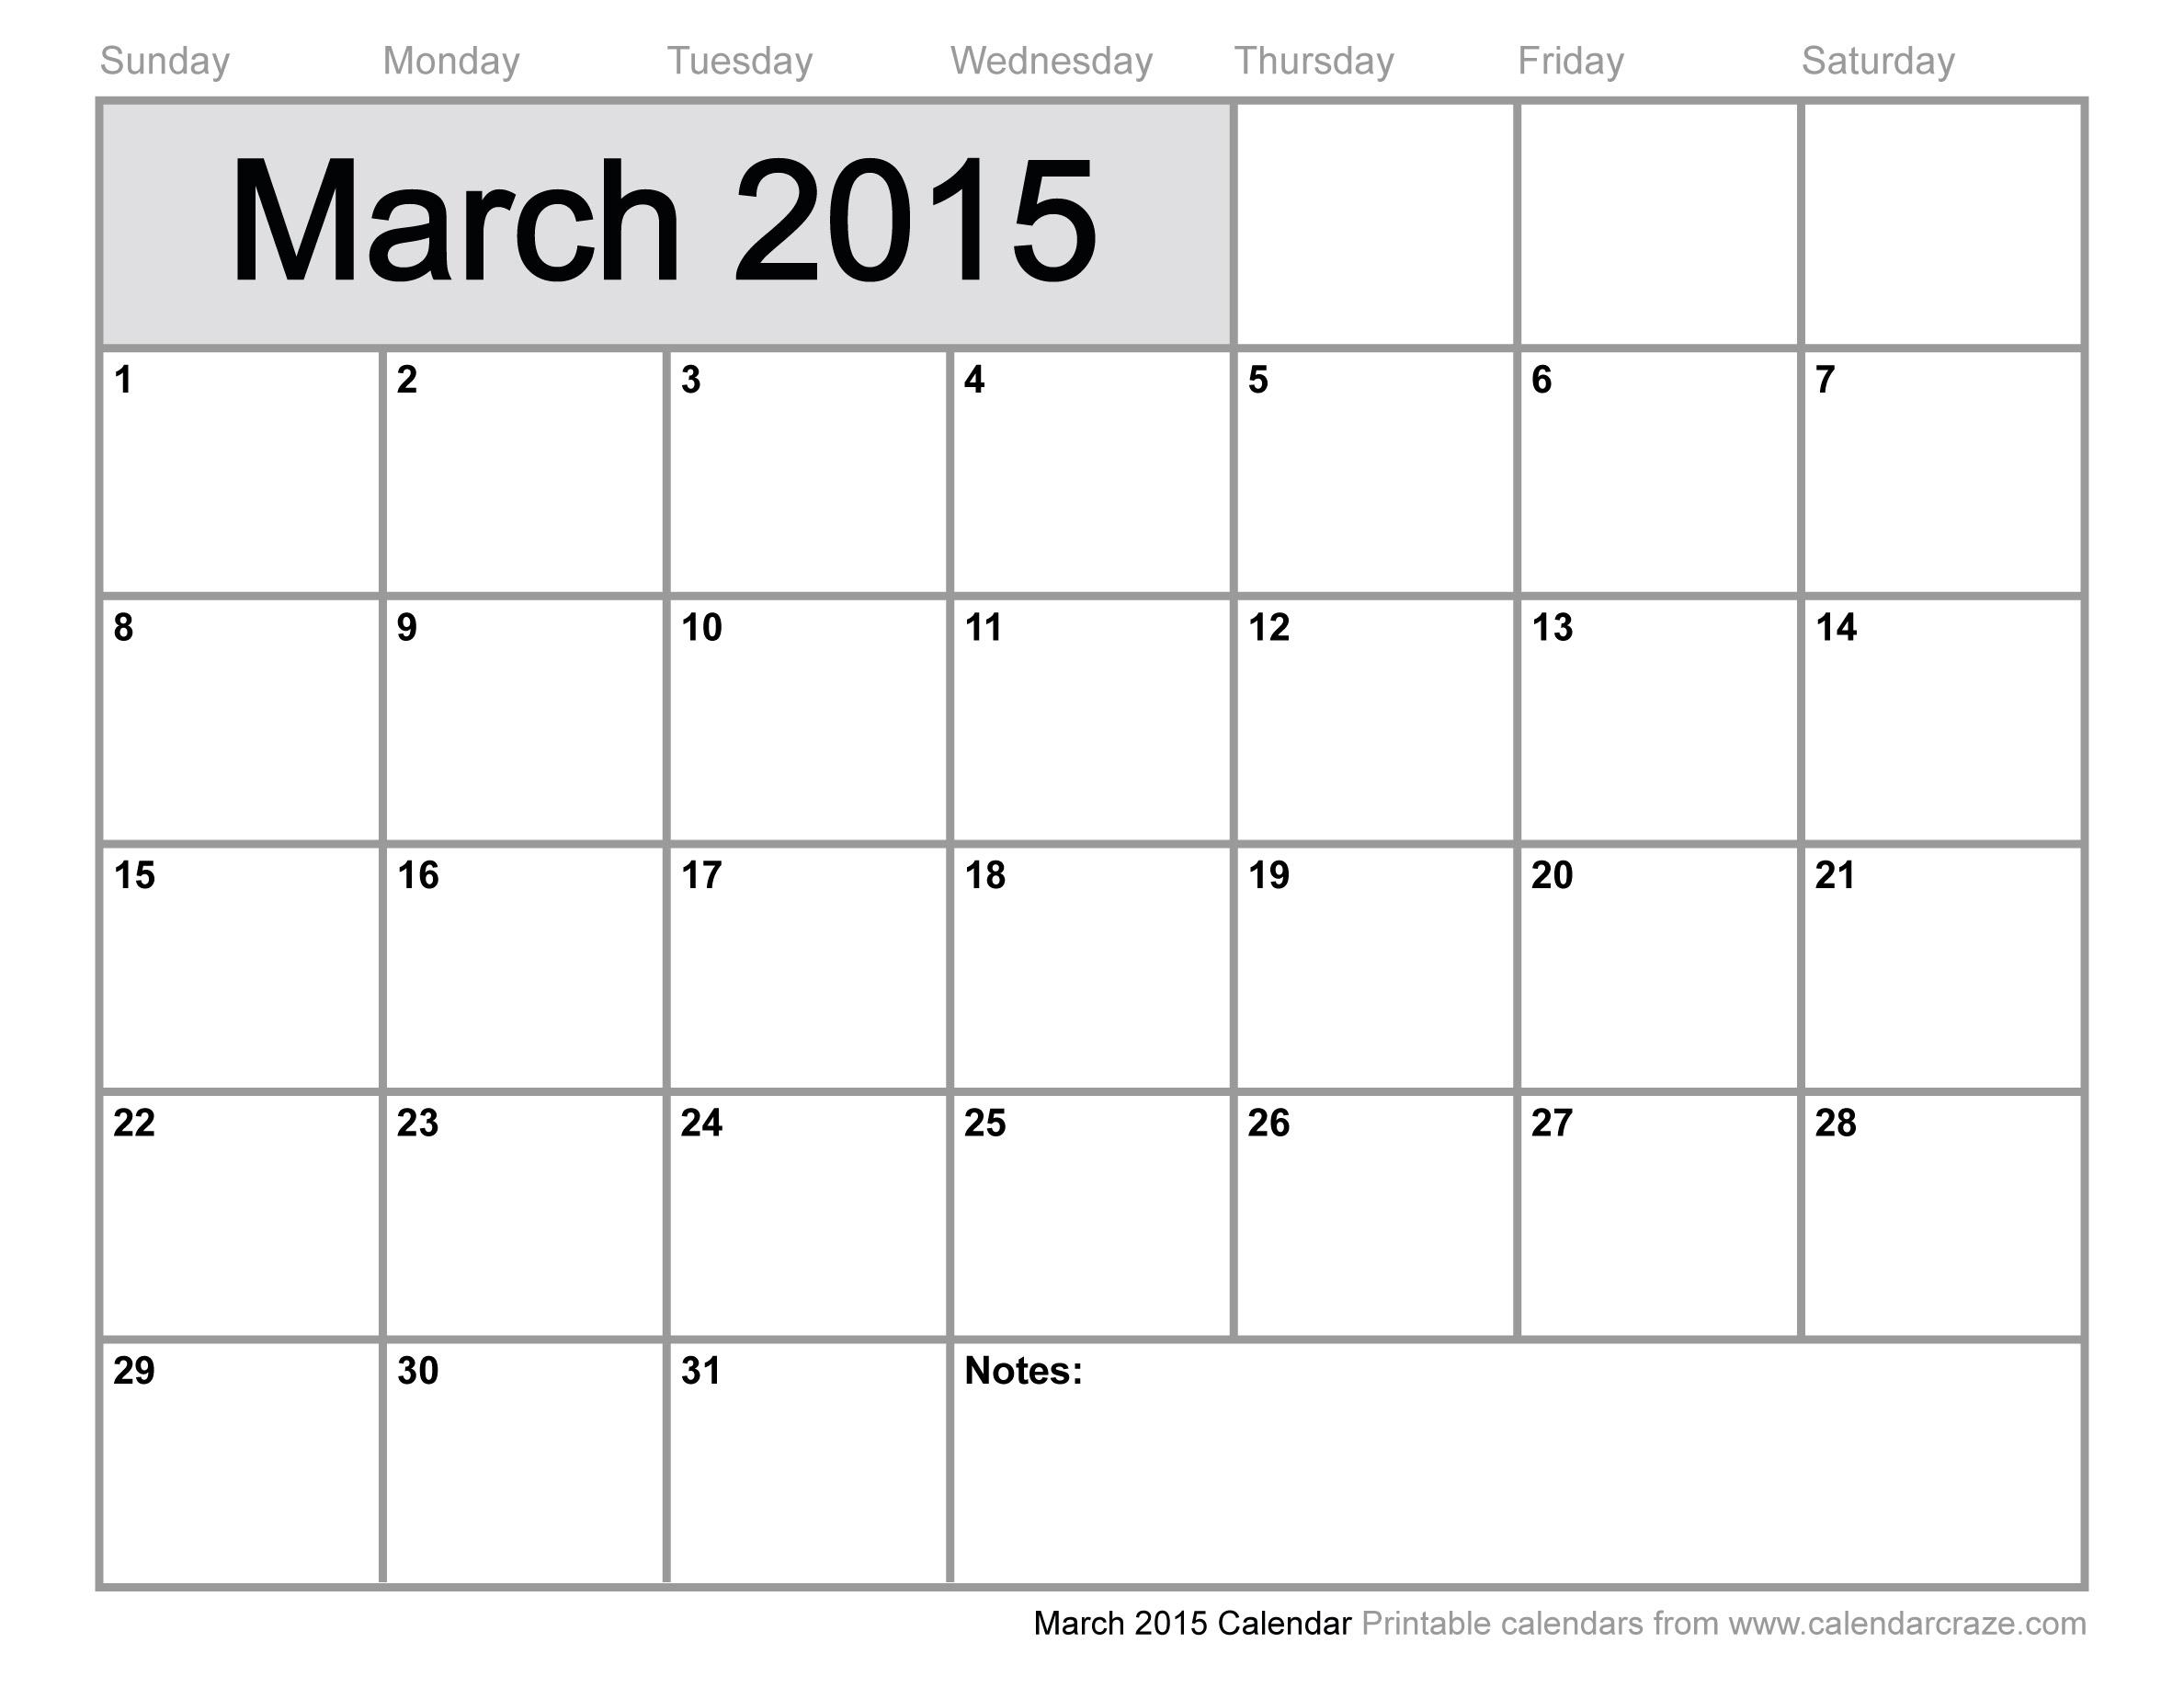 5 Images of Mar 2015 Calendar Printable Free